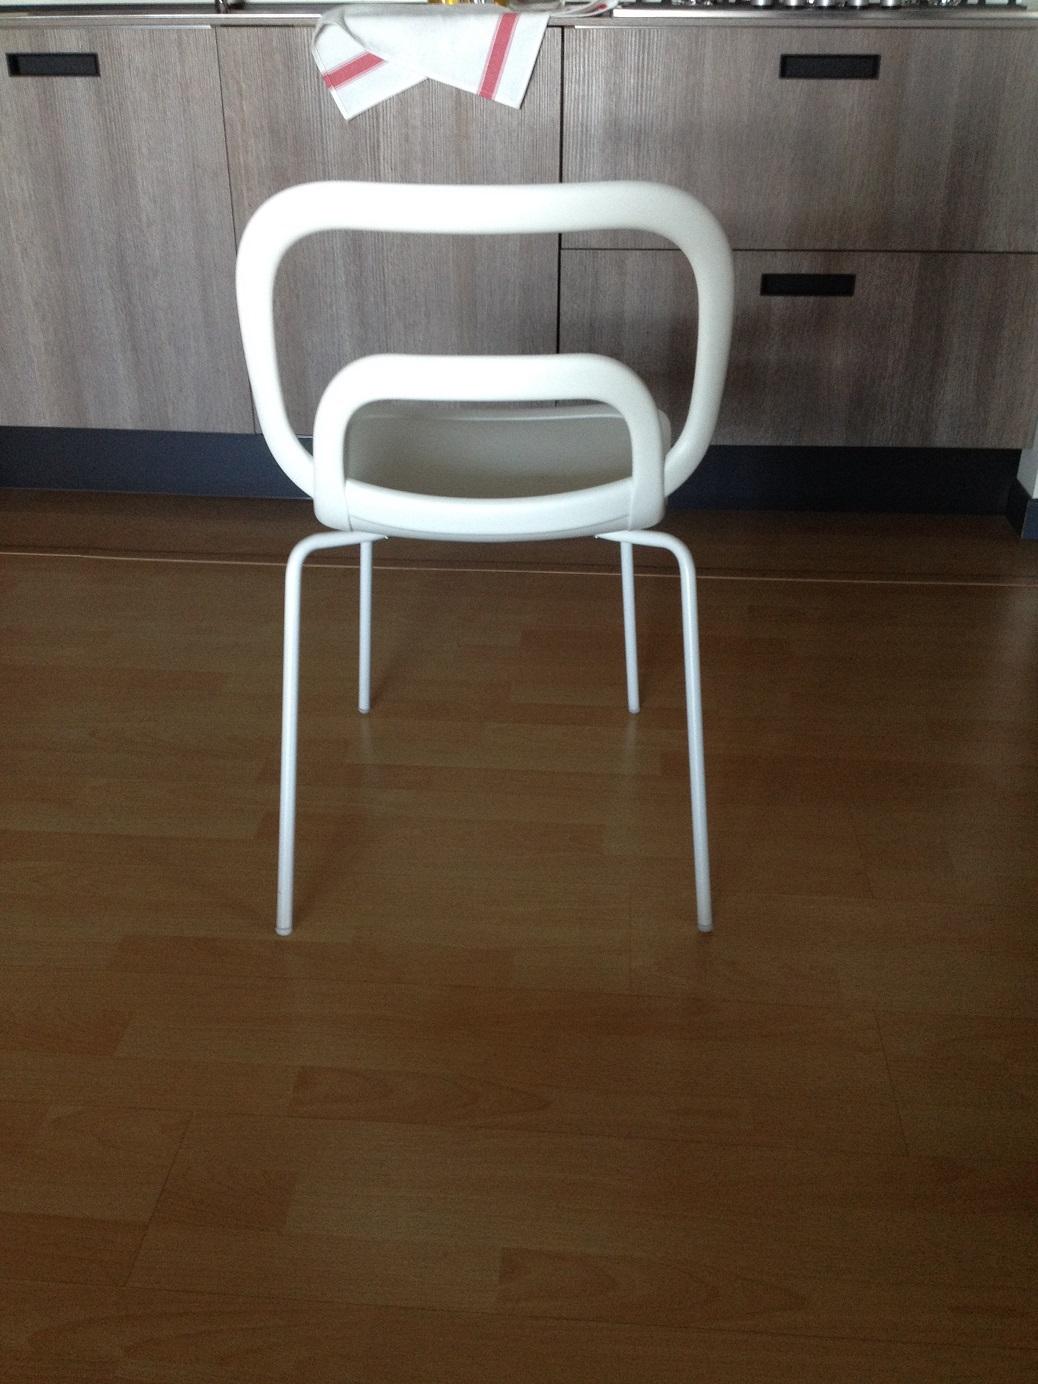 Sedie bianche moderne ciacci scontate del 50 sedie a for Sedie moderne economiche per cucina